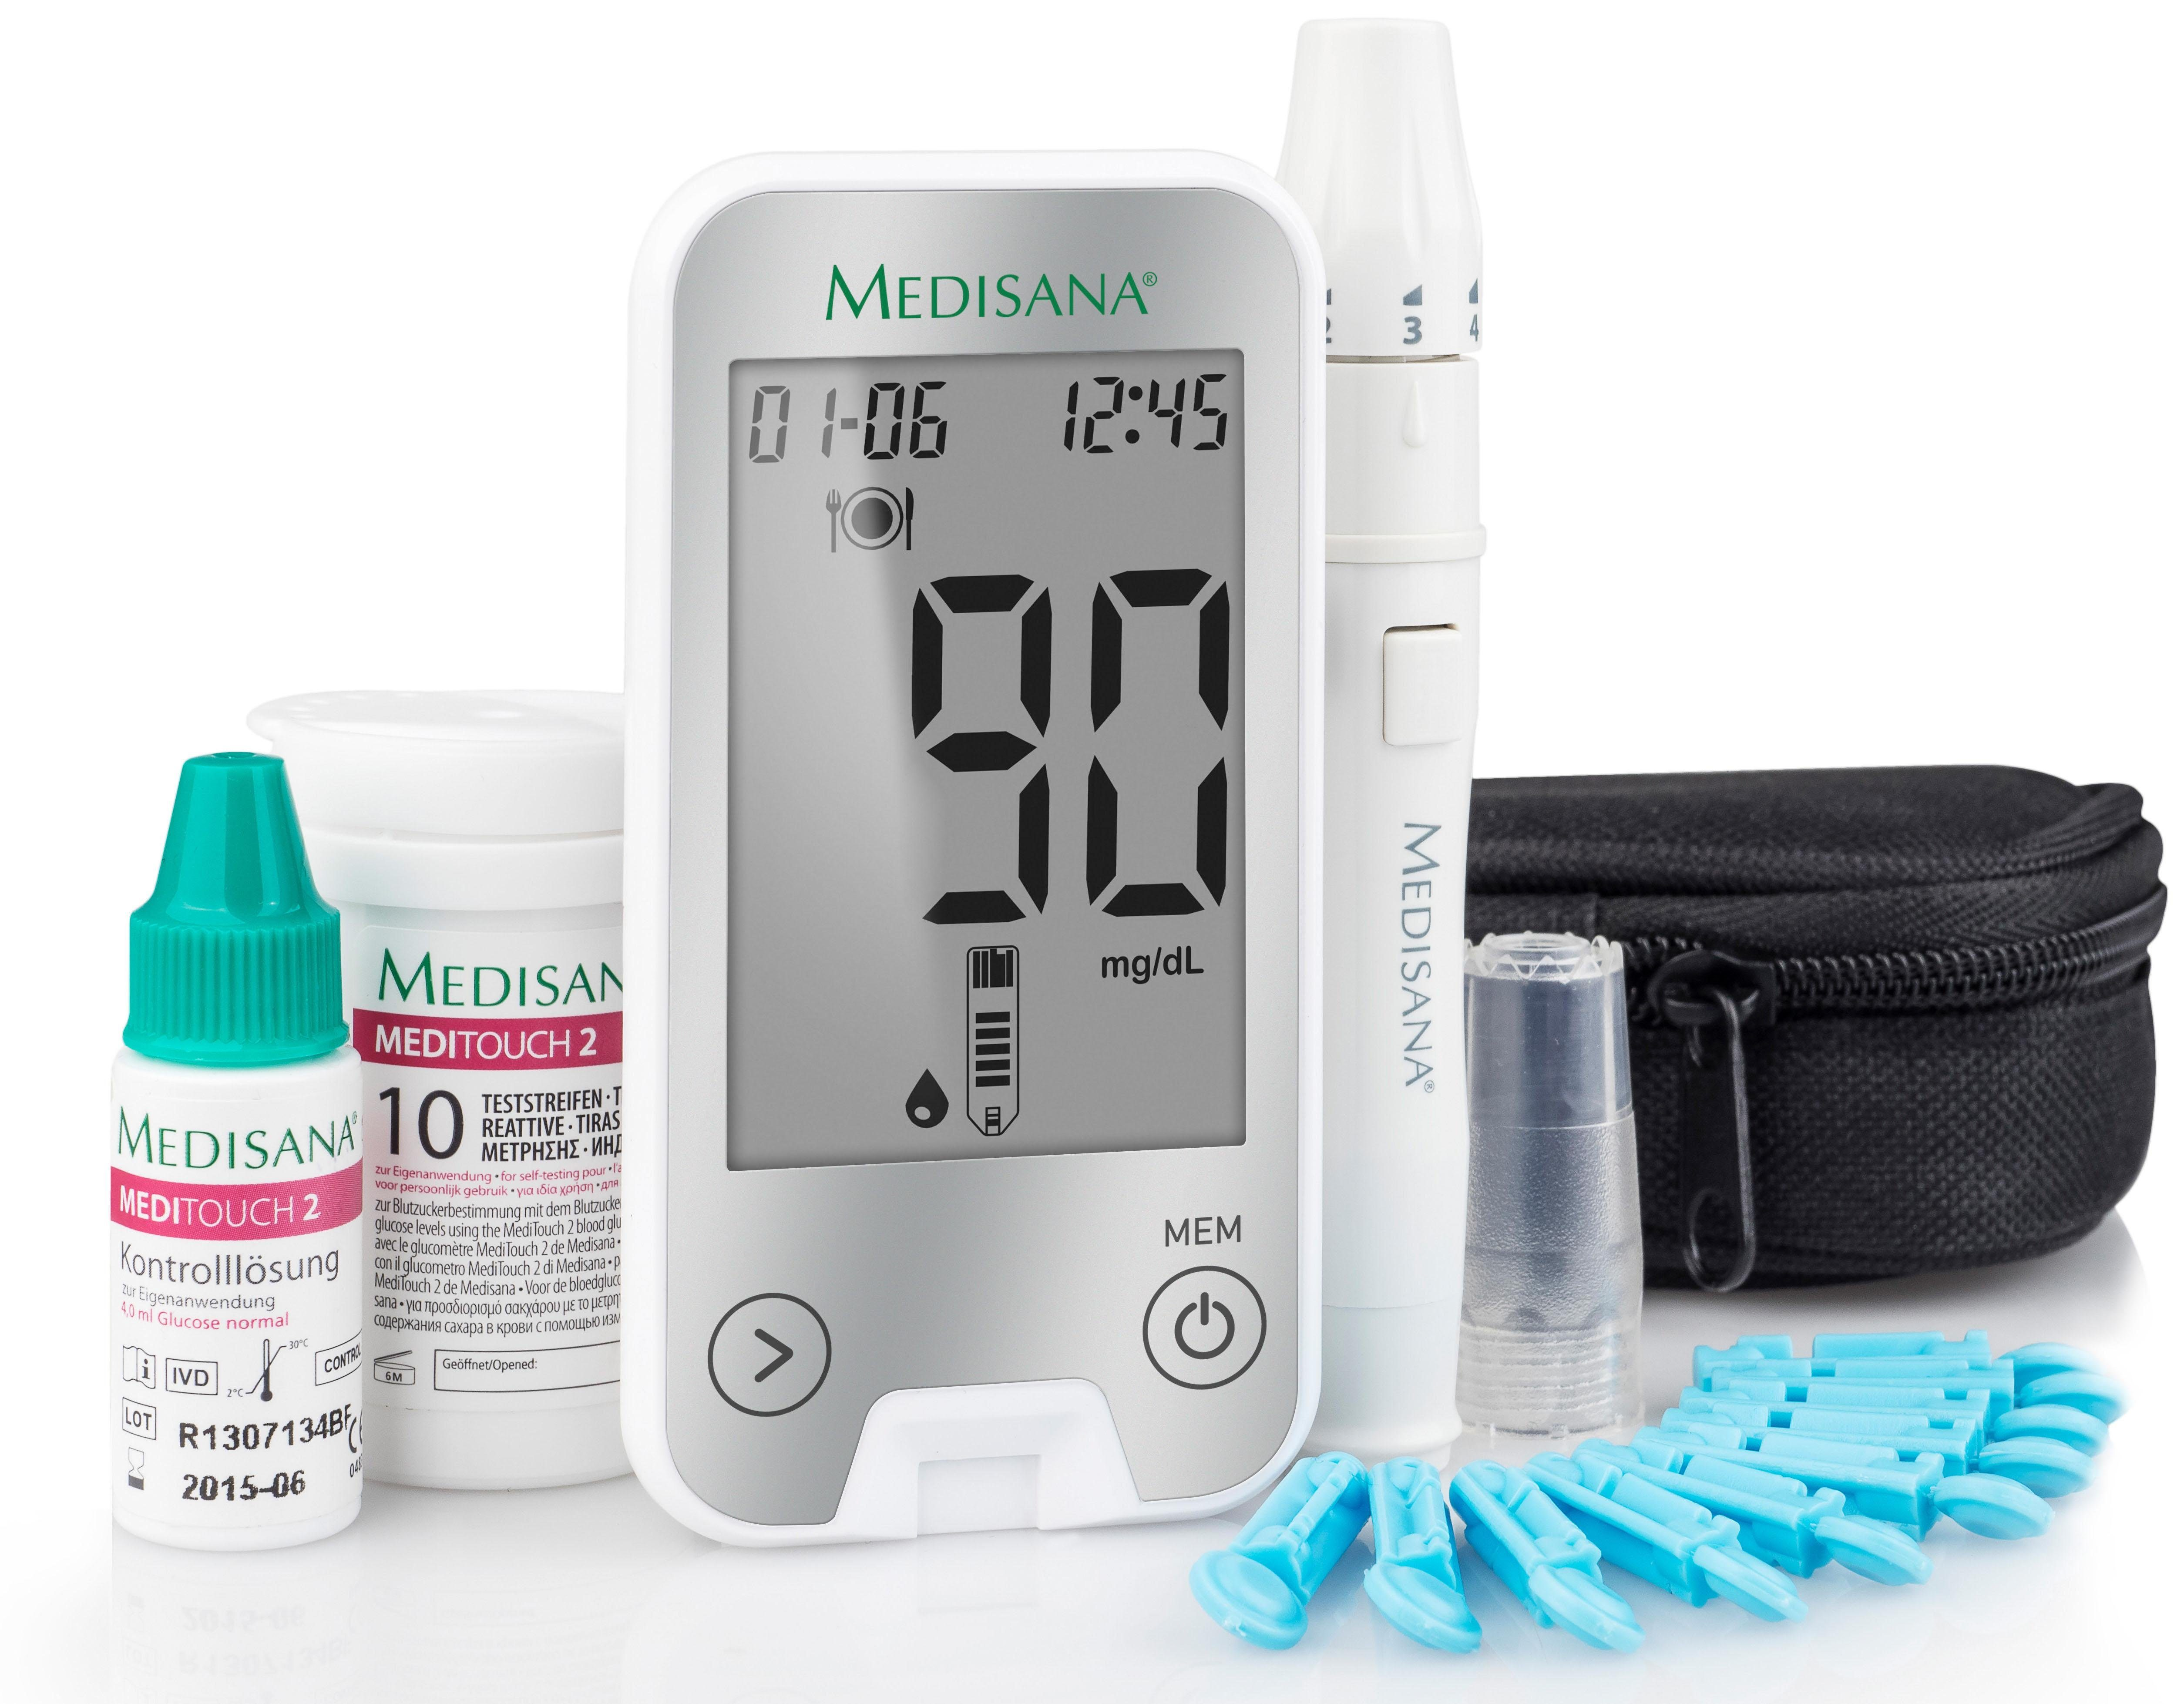 Medisana Blutzuckermessgerät MediTouch 2 Connect M79044 Blutzucker, mit Bluetooth